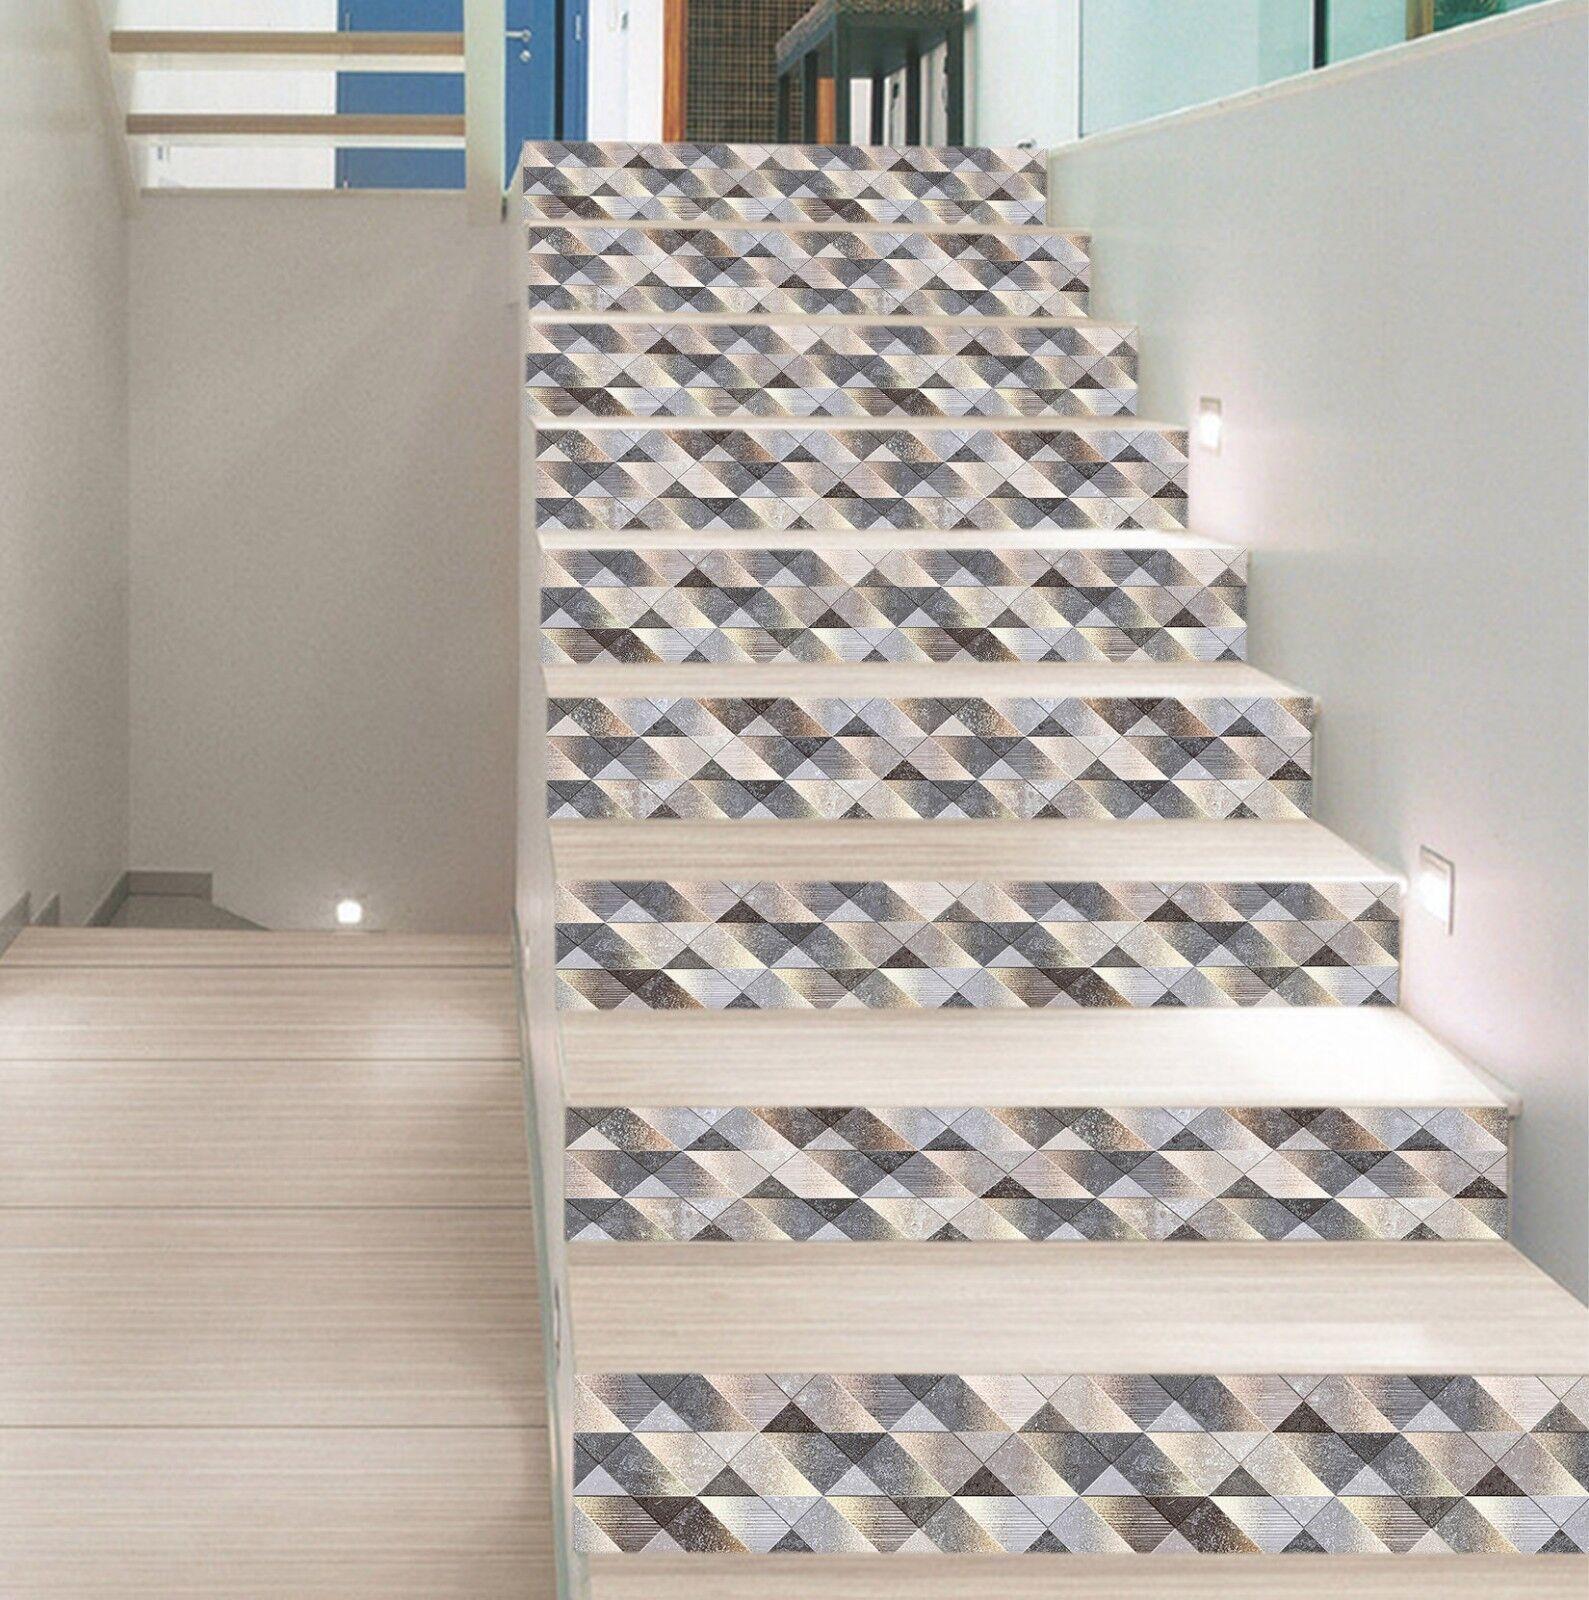 3D Paillette 7 Fliese Marmor Stair Risers Fototapete Vinyl Aufkleber Tapete